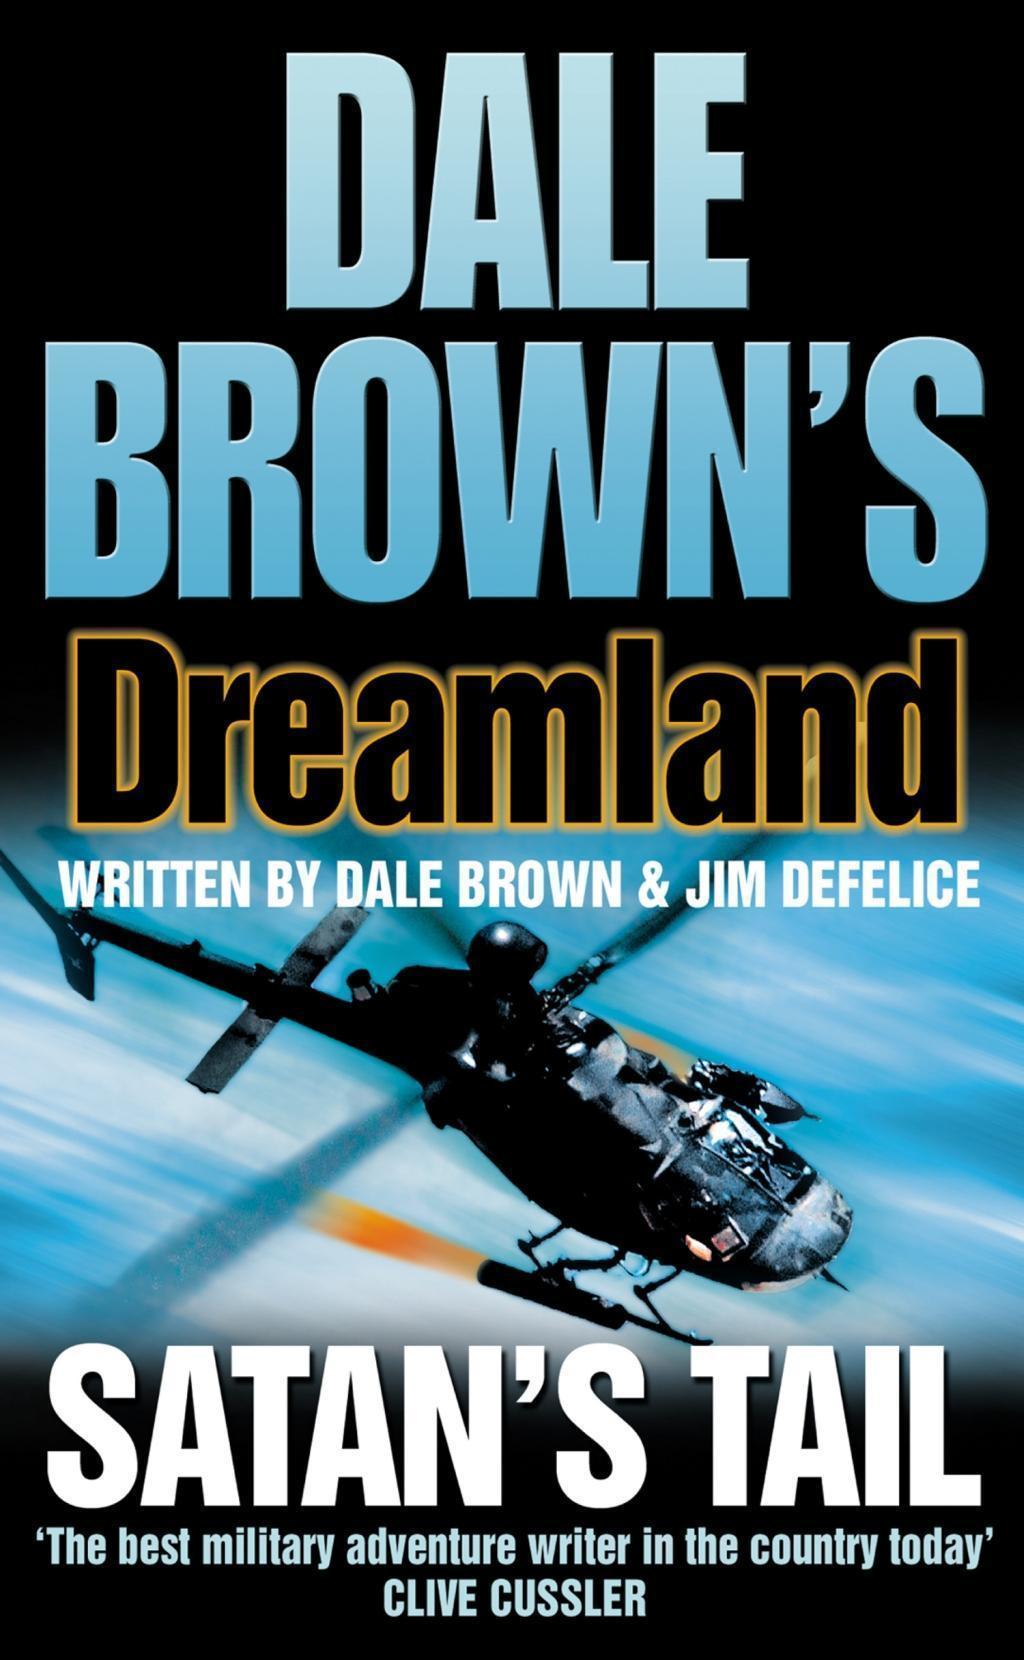 Satan's Tail (Dale Brown's Dreamland, Book 7)